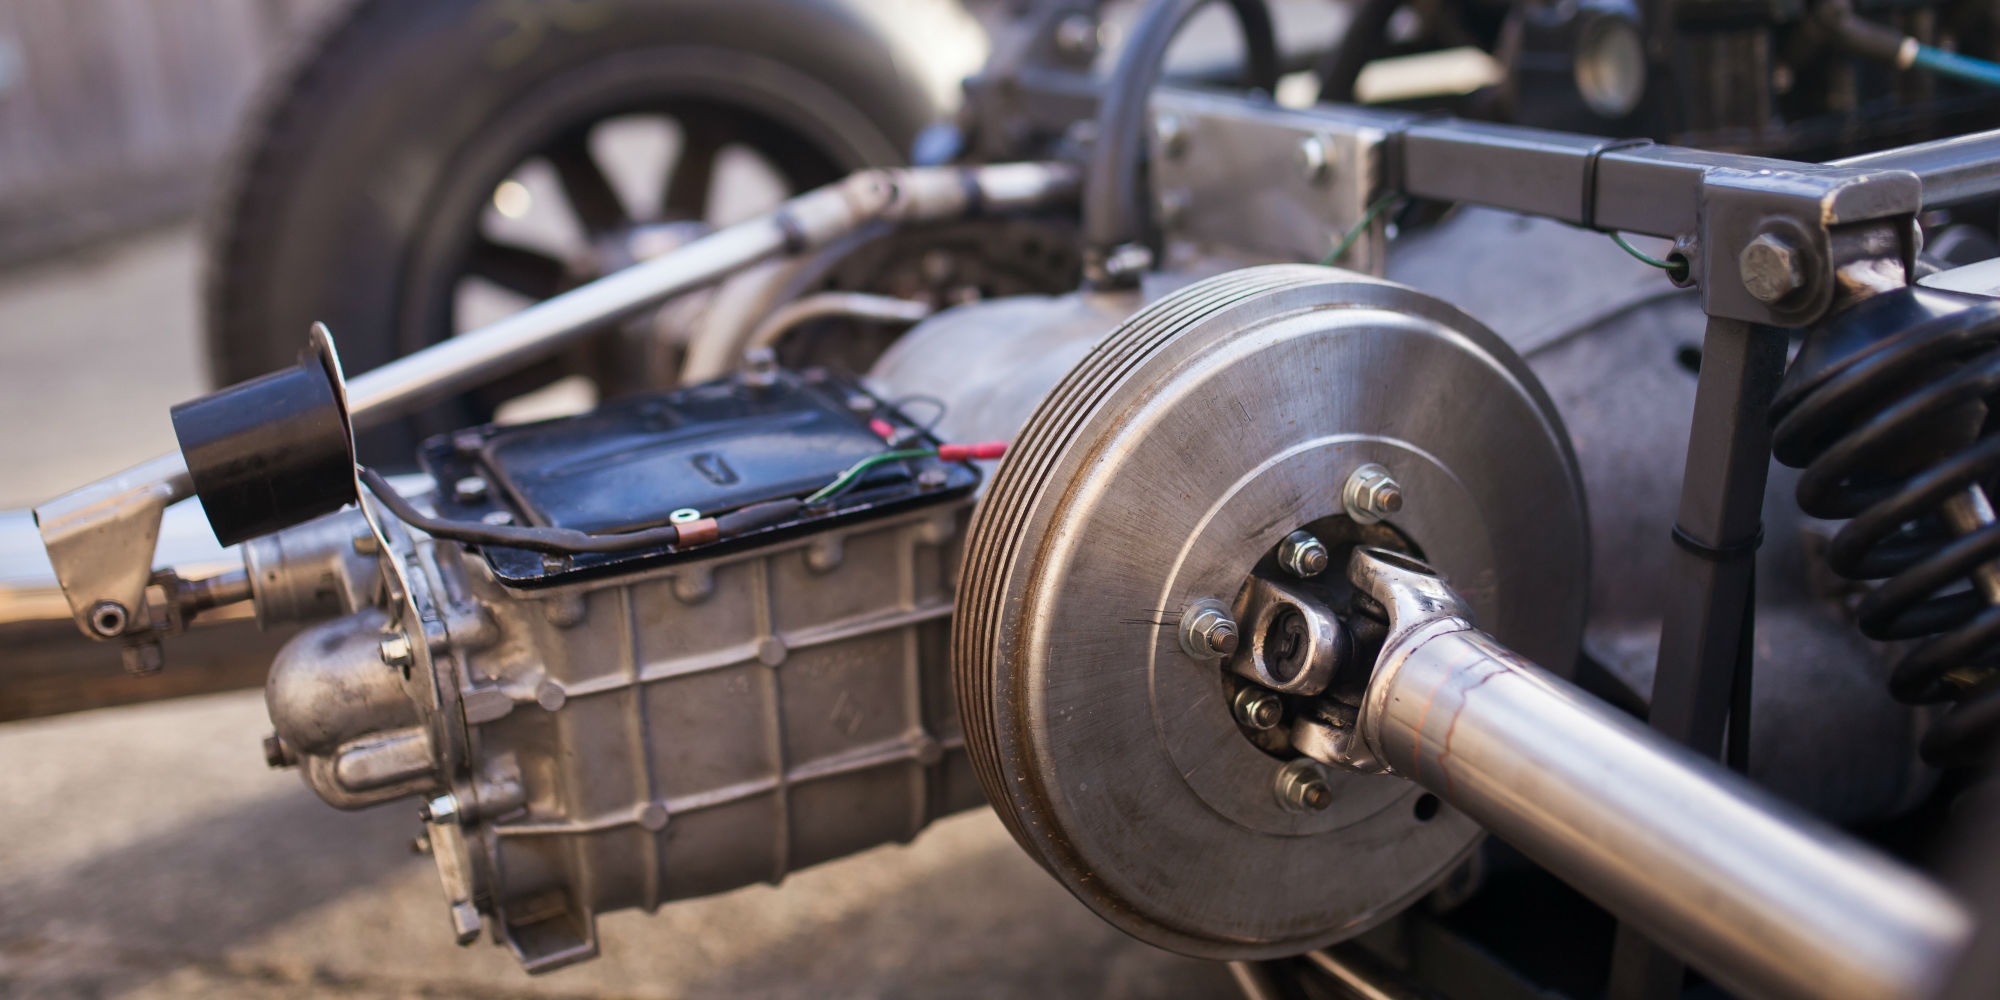 The Ex – Works, Mike Parkes 1961 Gemini Mk3A Formula Junior